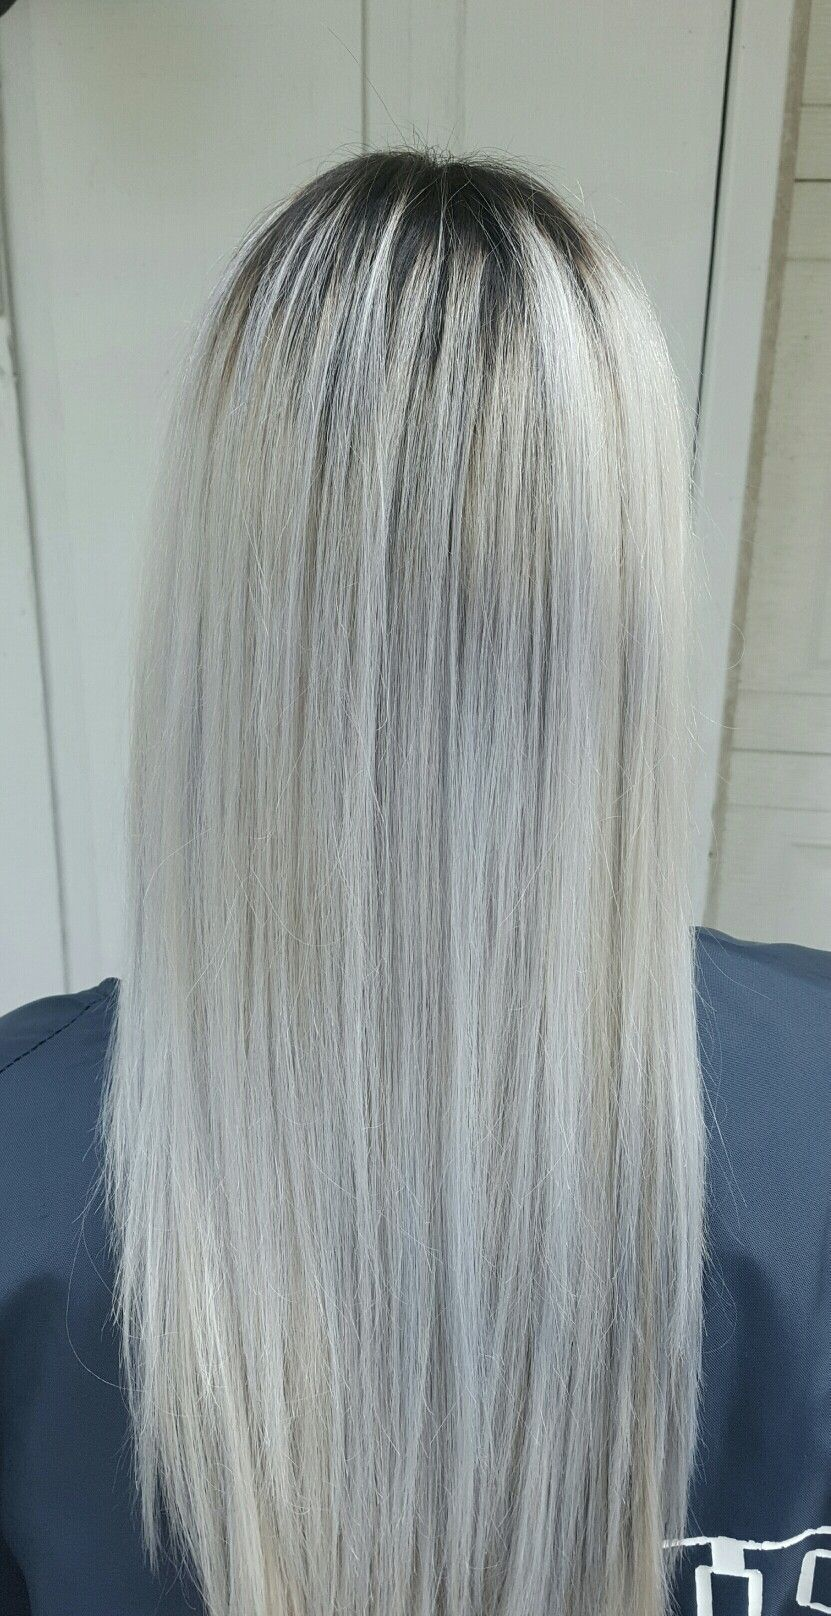 Dark Shadow Root Platinum White Blonde Hair With Blue Tones By Amanda Redken Shades Eq 09b Silver Blonde Hair Silver White Hair White Blonde Hair